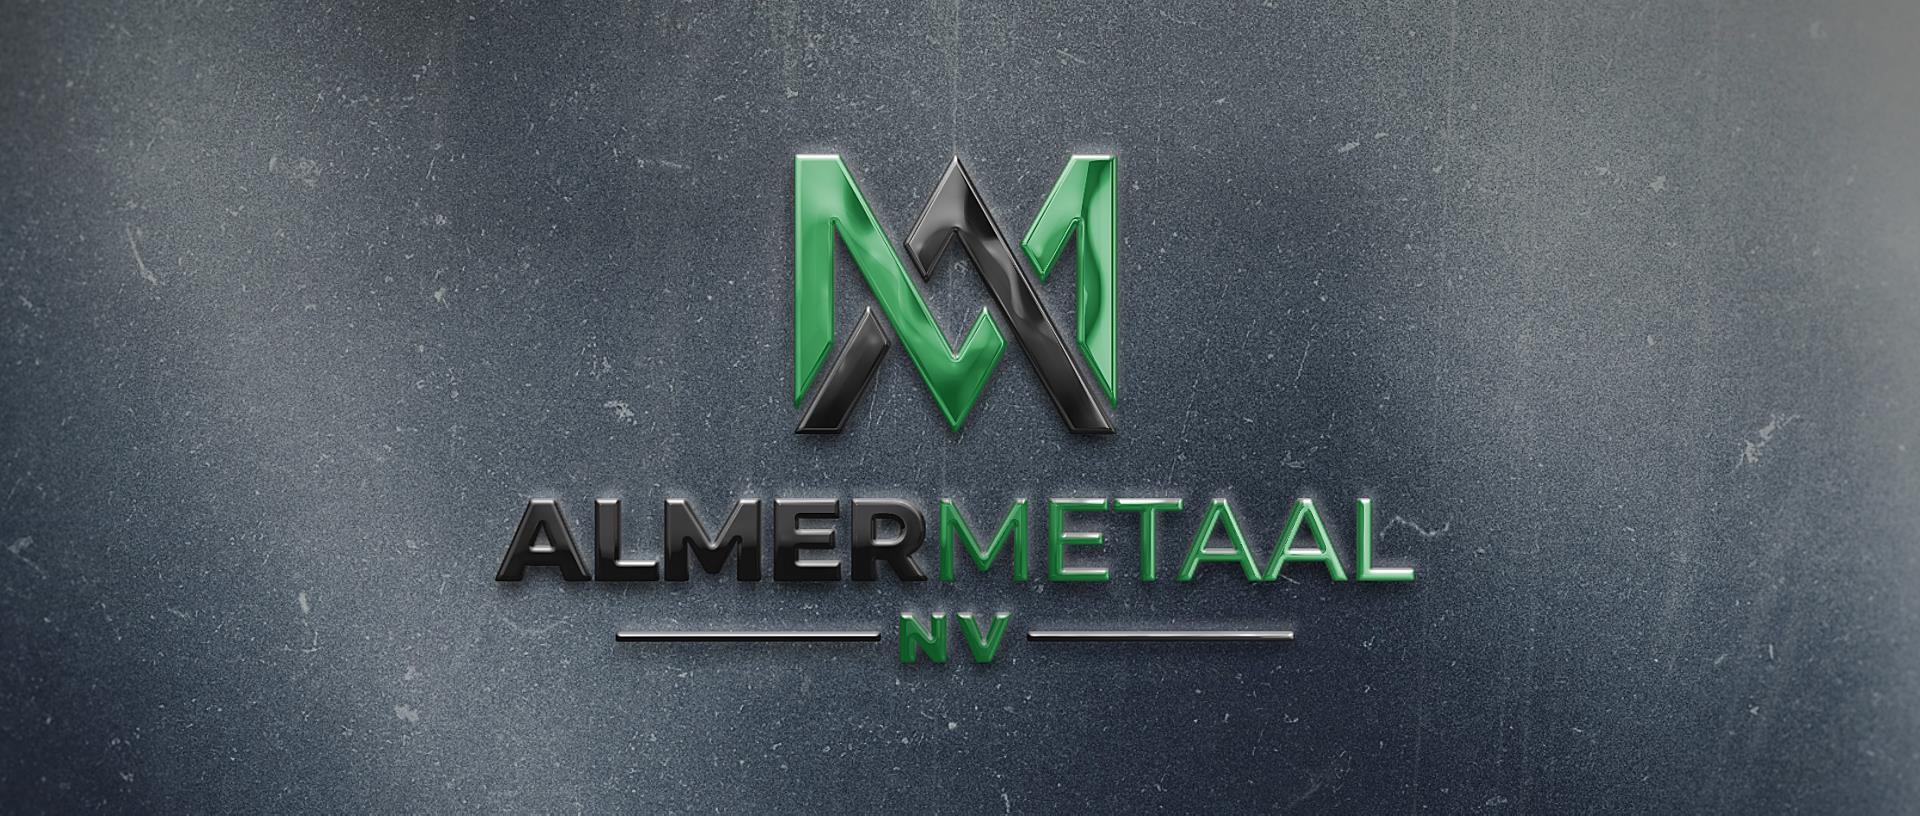 almermetaal nv intro logo